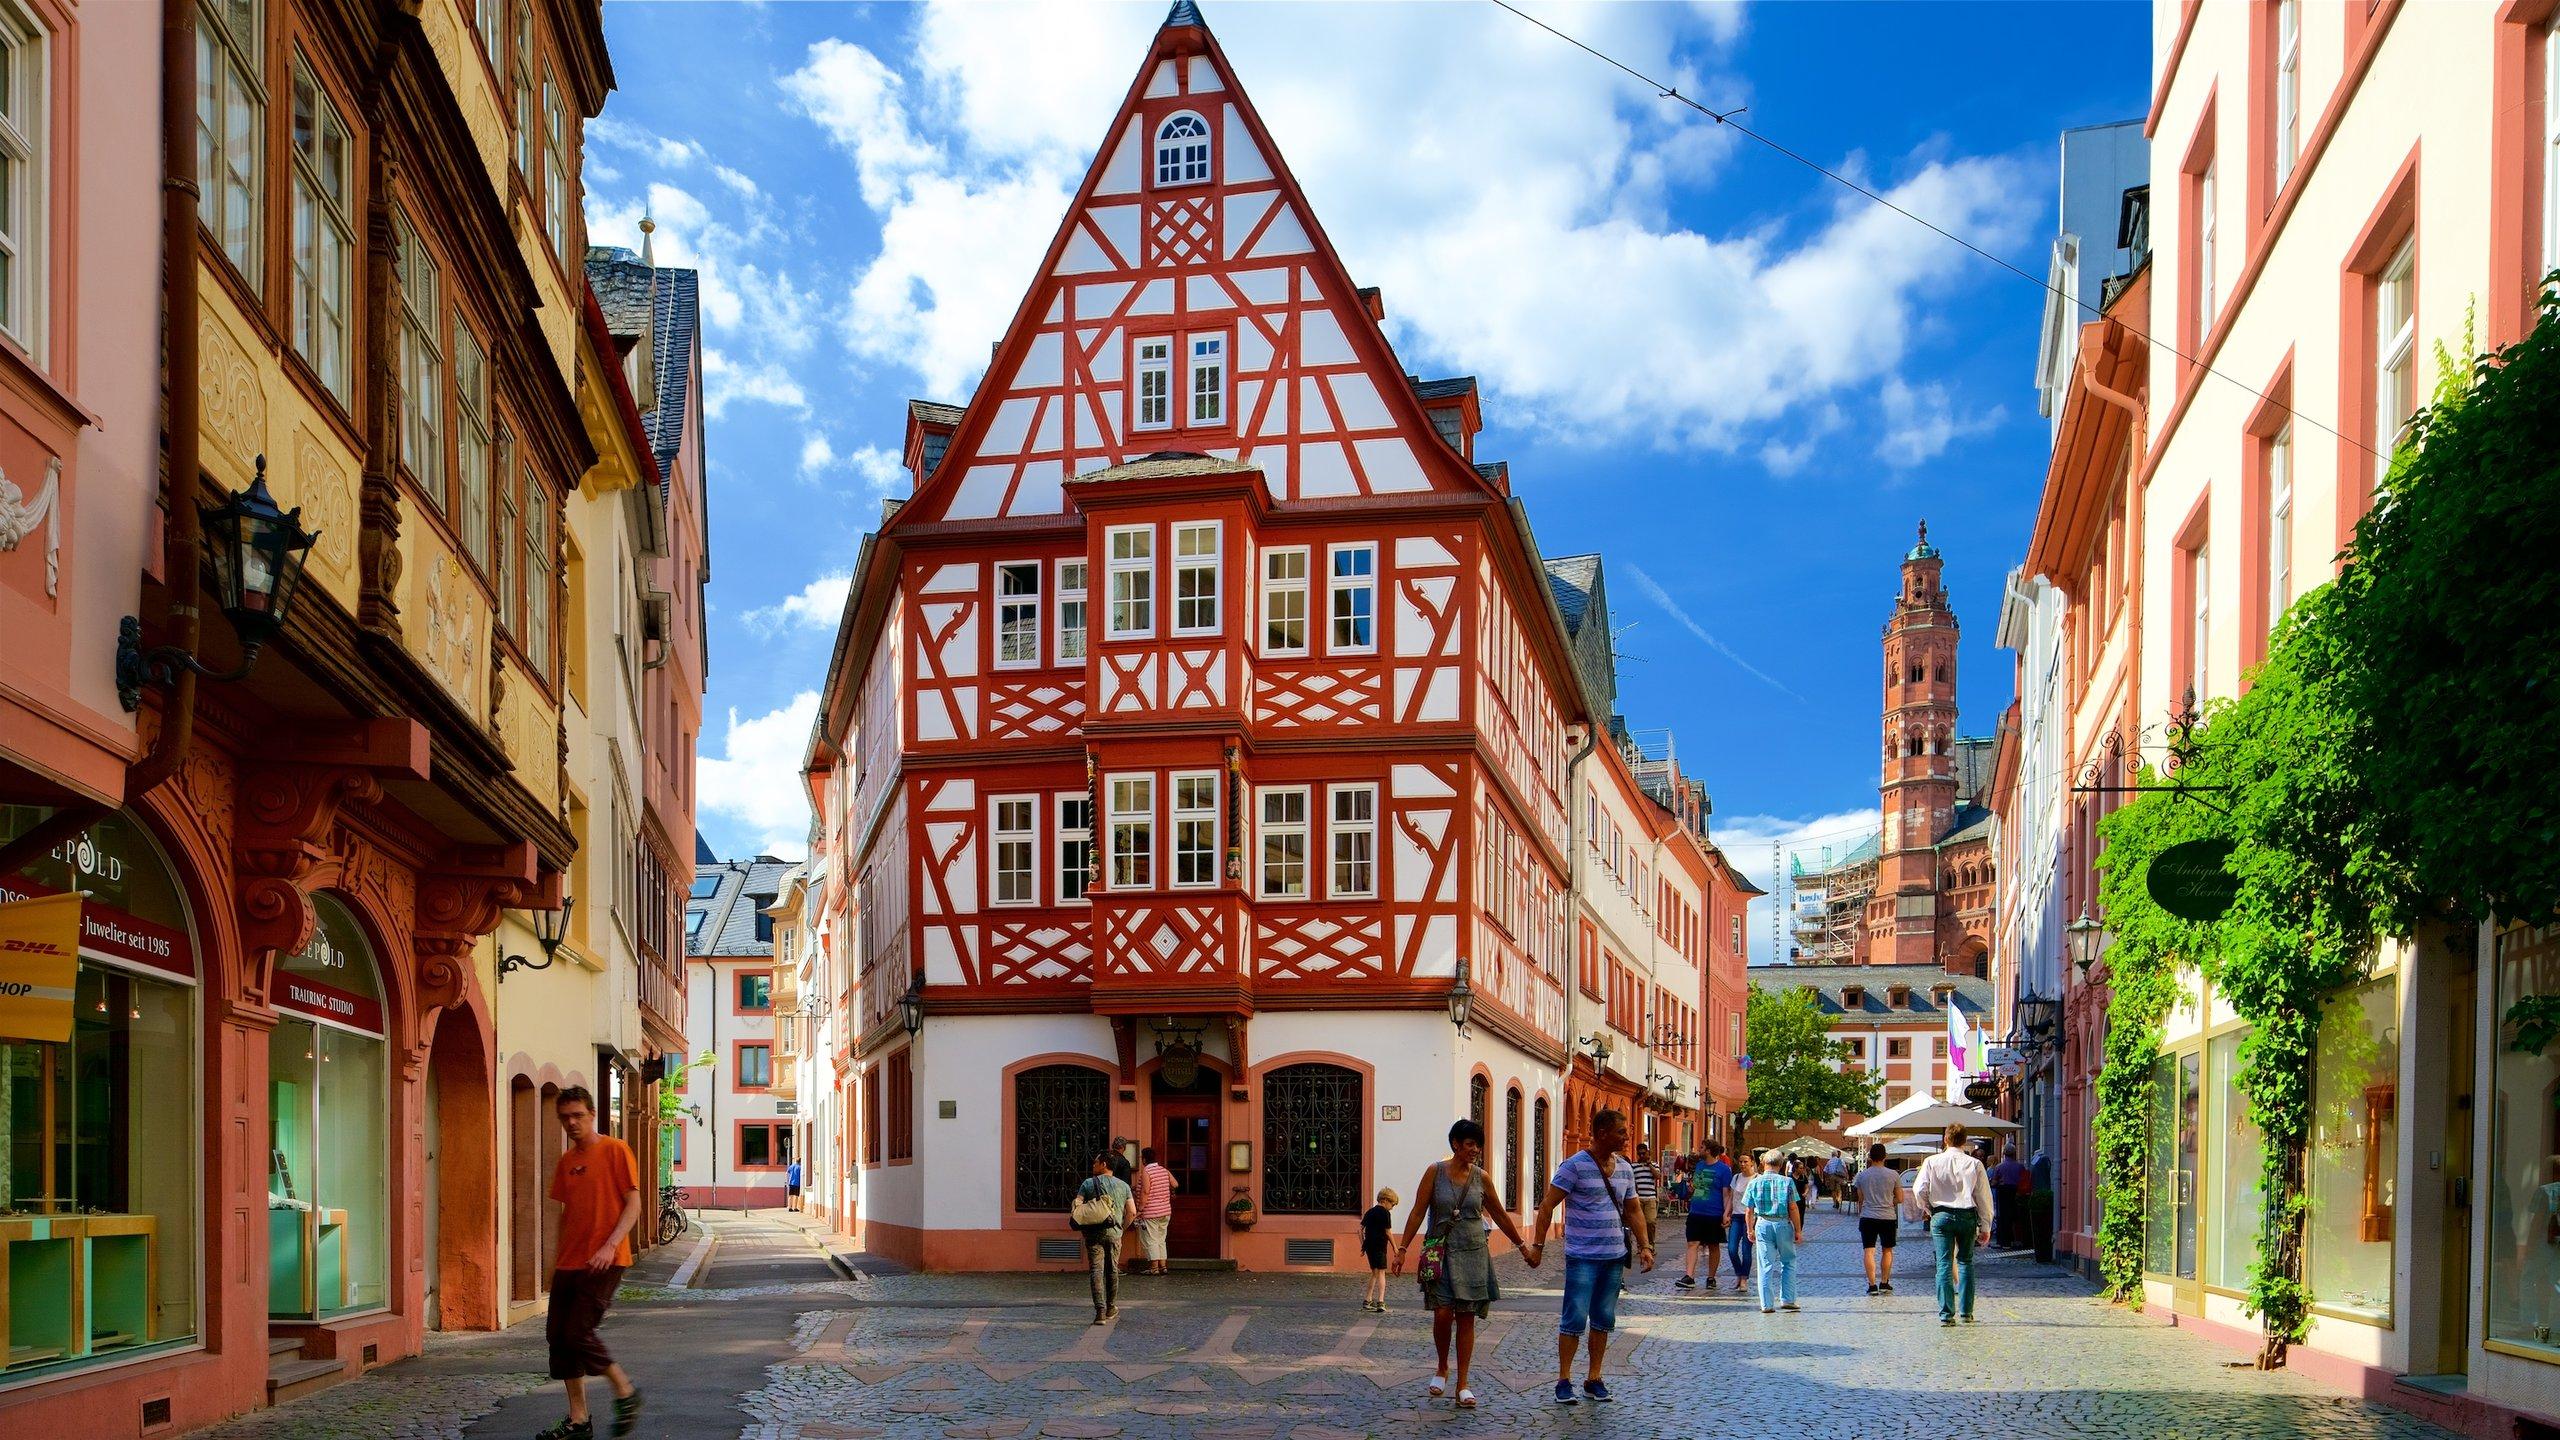 Hotel Mainz Gunstig Buchen Hotels Expedia De